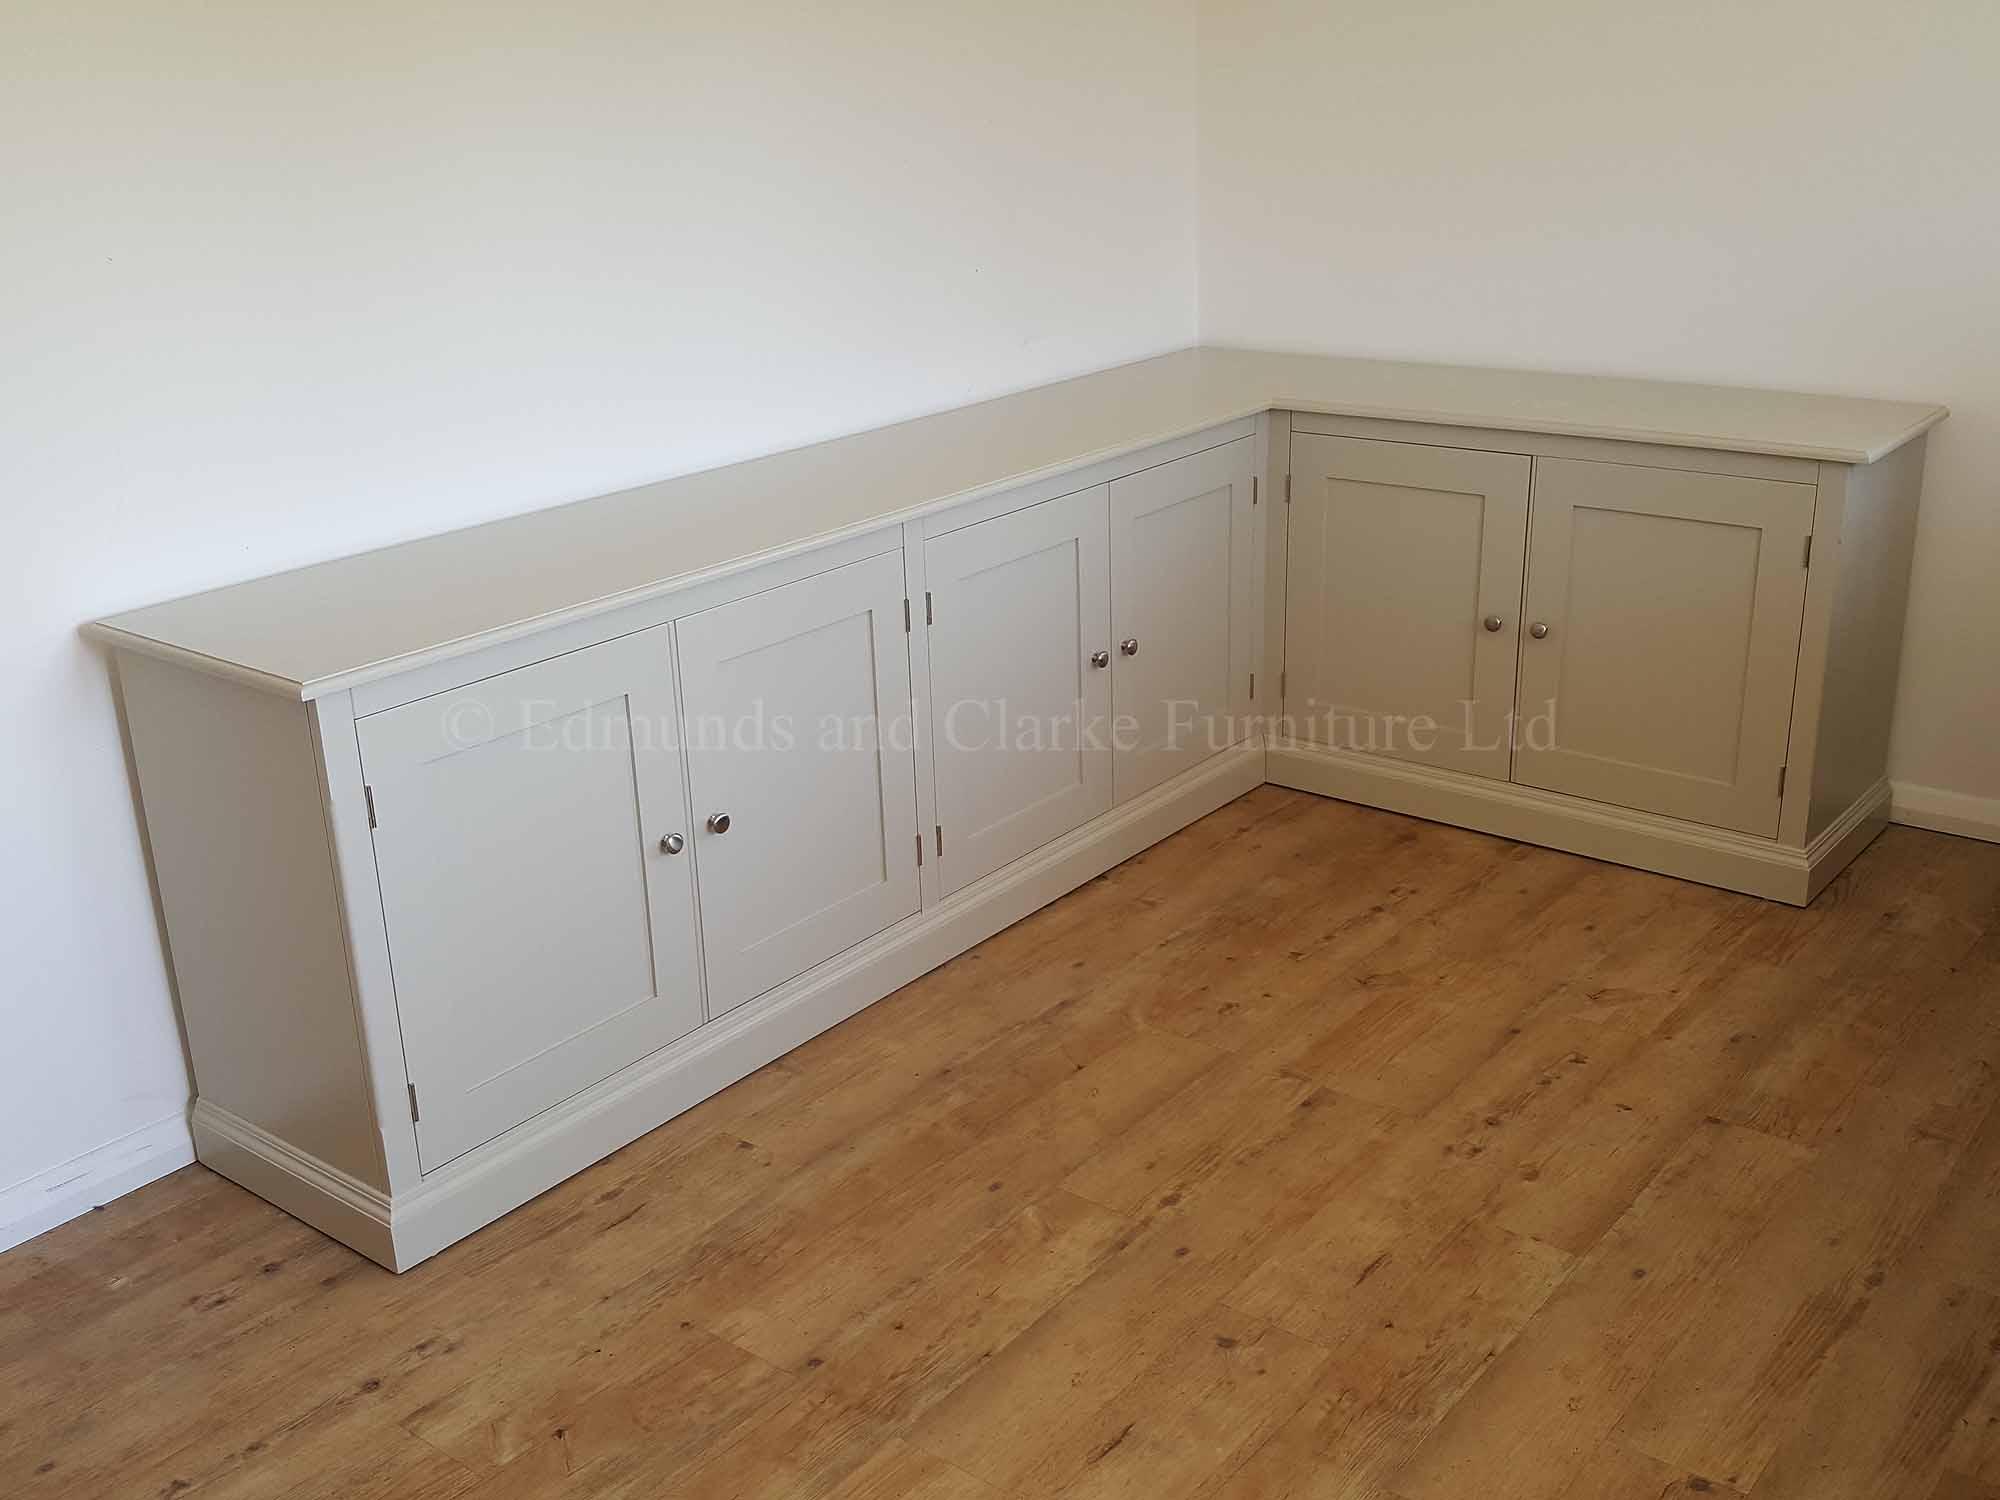 Edmunds painted corner bookcase base cupboards 6 doors